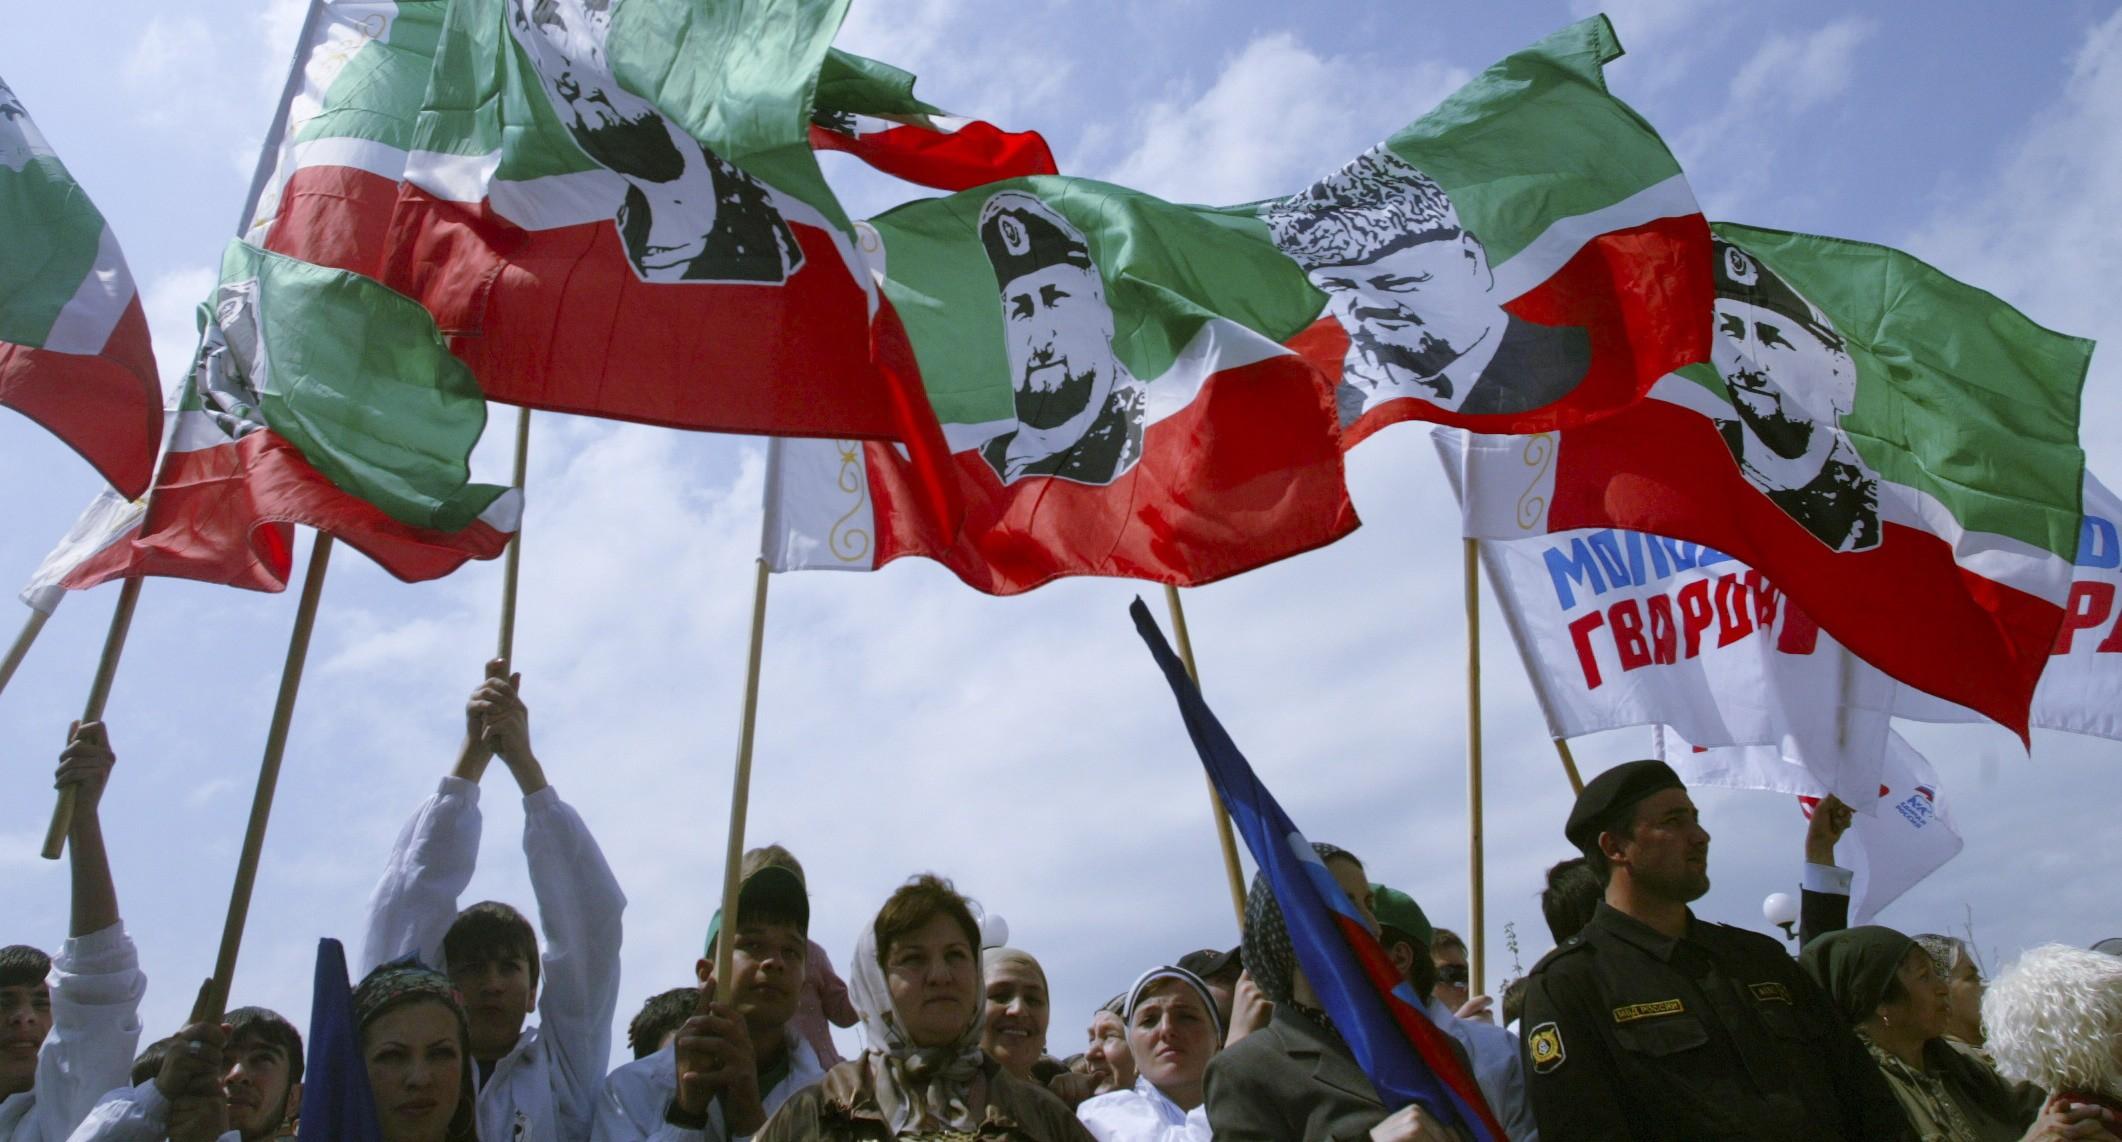 Флаги в Грозном. REUTERS/Sergei Karpukhin